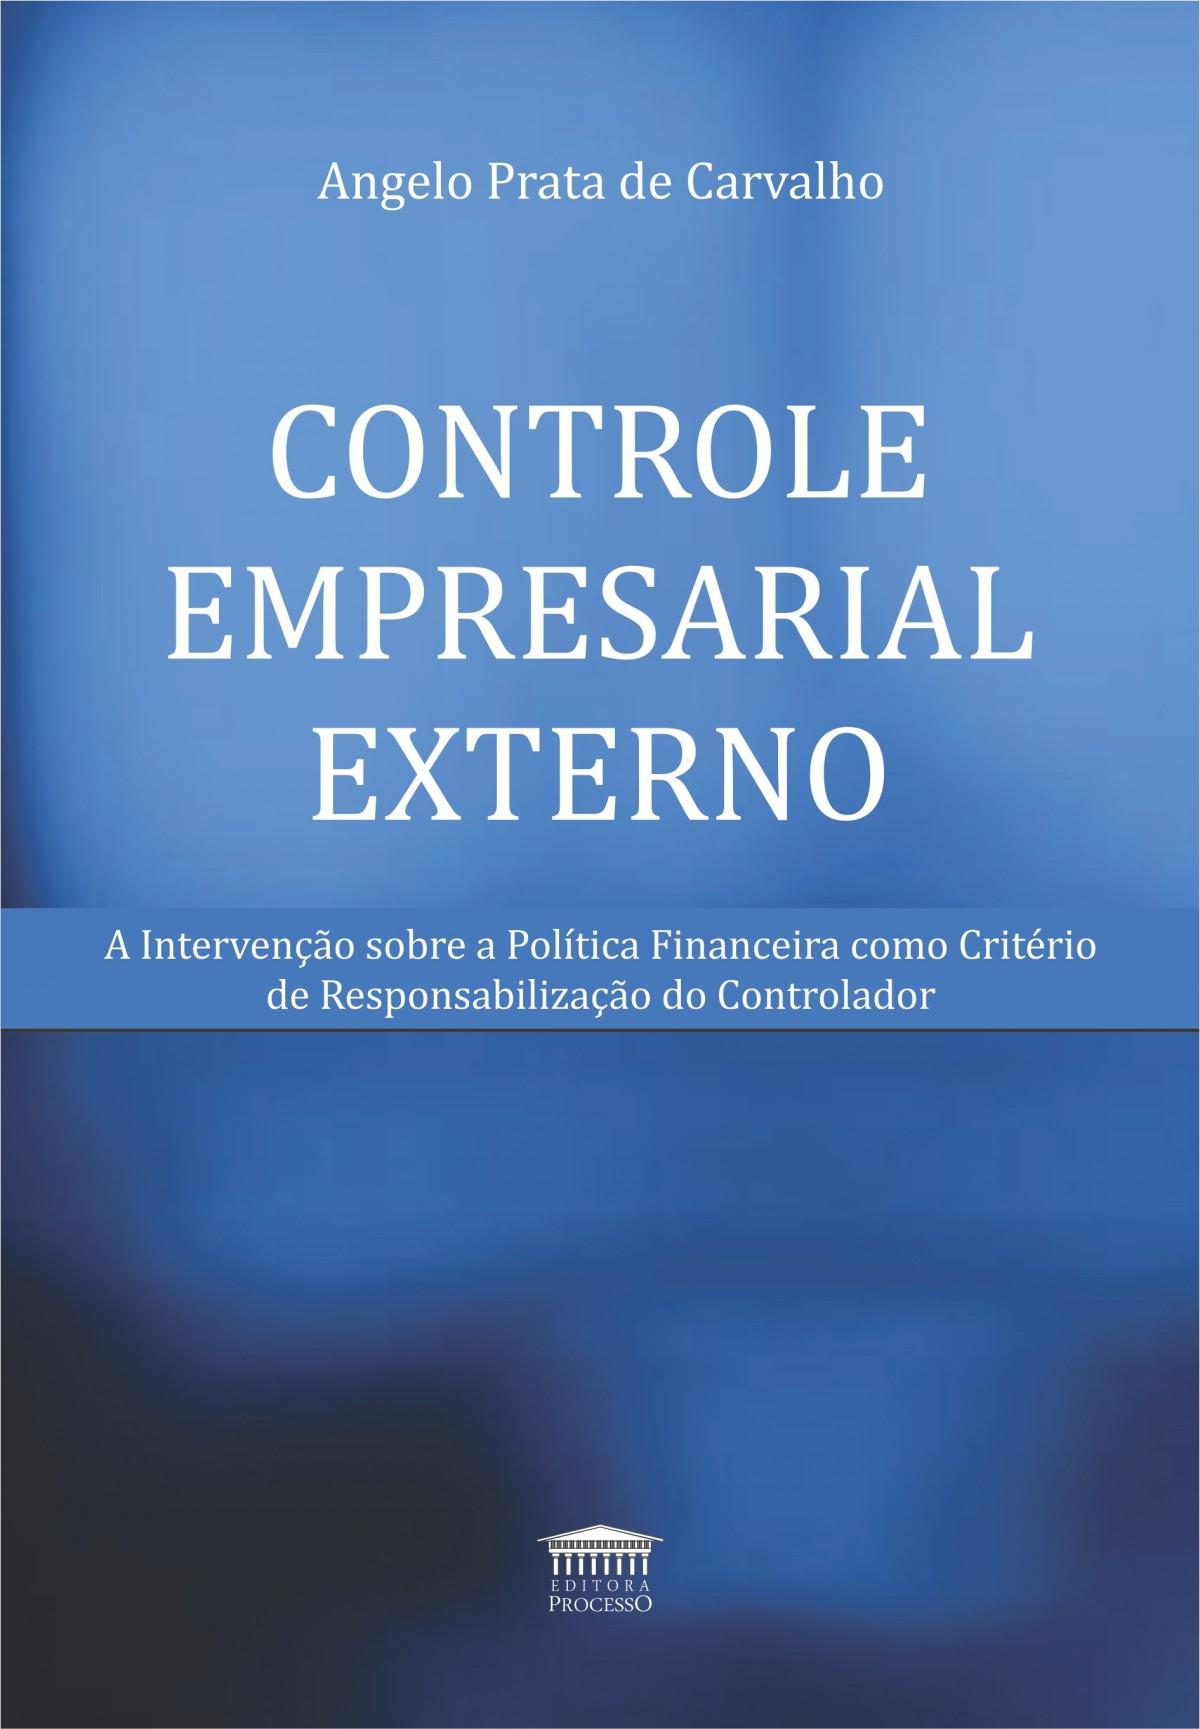 Foto 1 - Controle Empresarial Externo